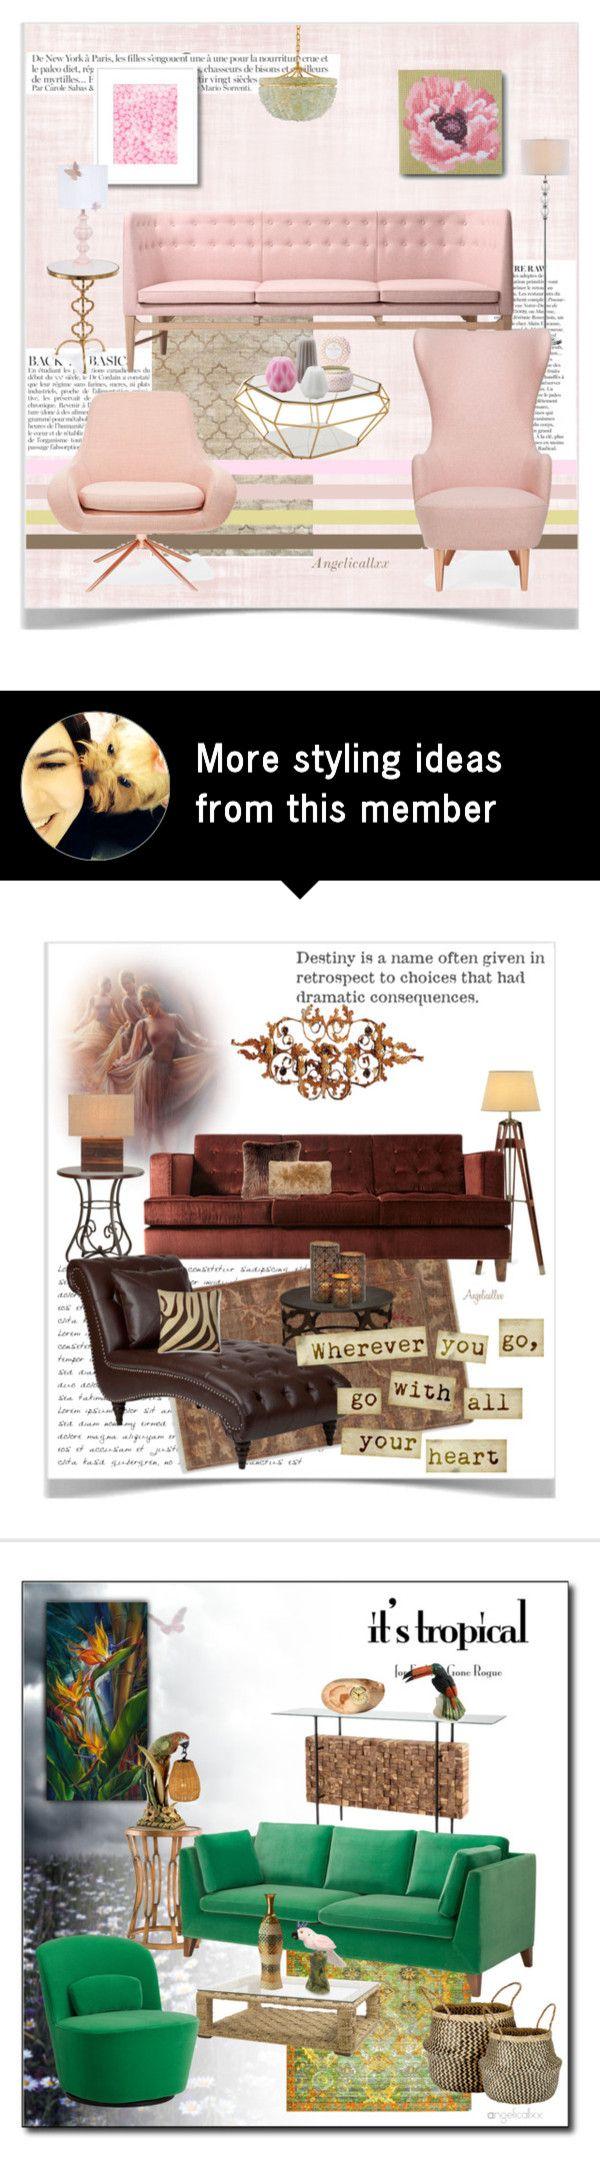 """Simply Pink"" by angelicallxx on Polyvore featuring interior, interiors, interior design, дом, home decor, interior decorating, Anja, Safavieh, Regina-Andrew Design и &Tradition"